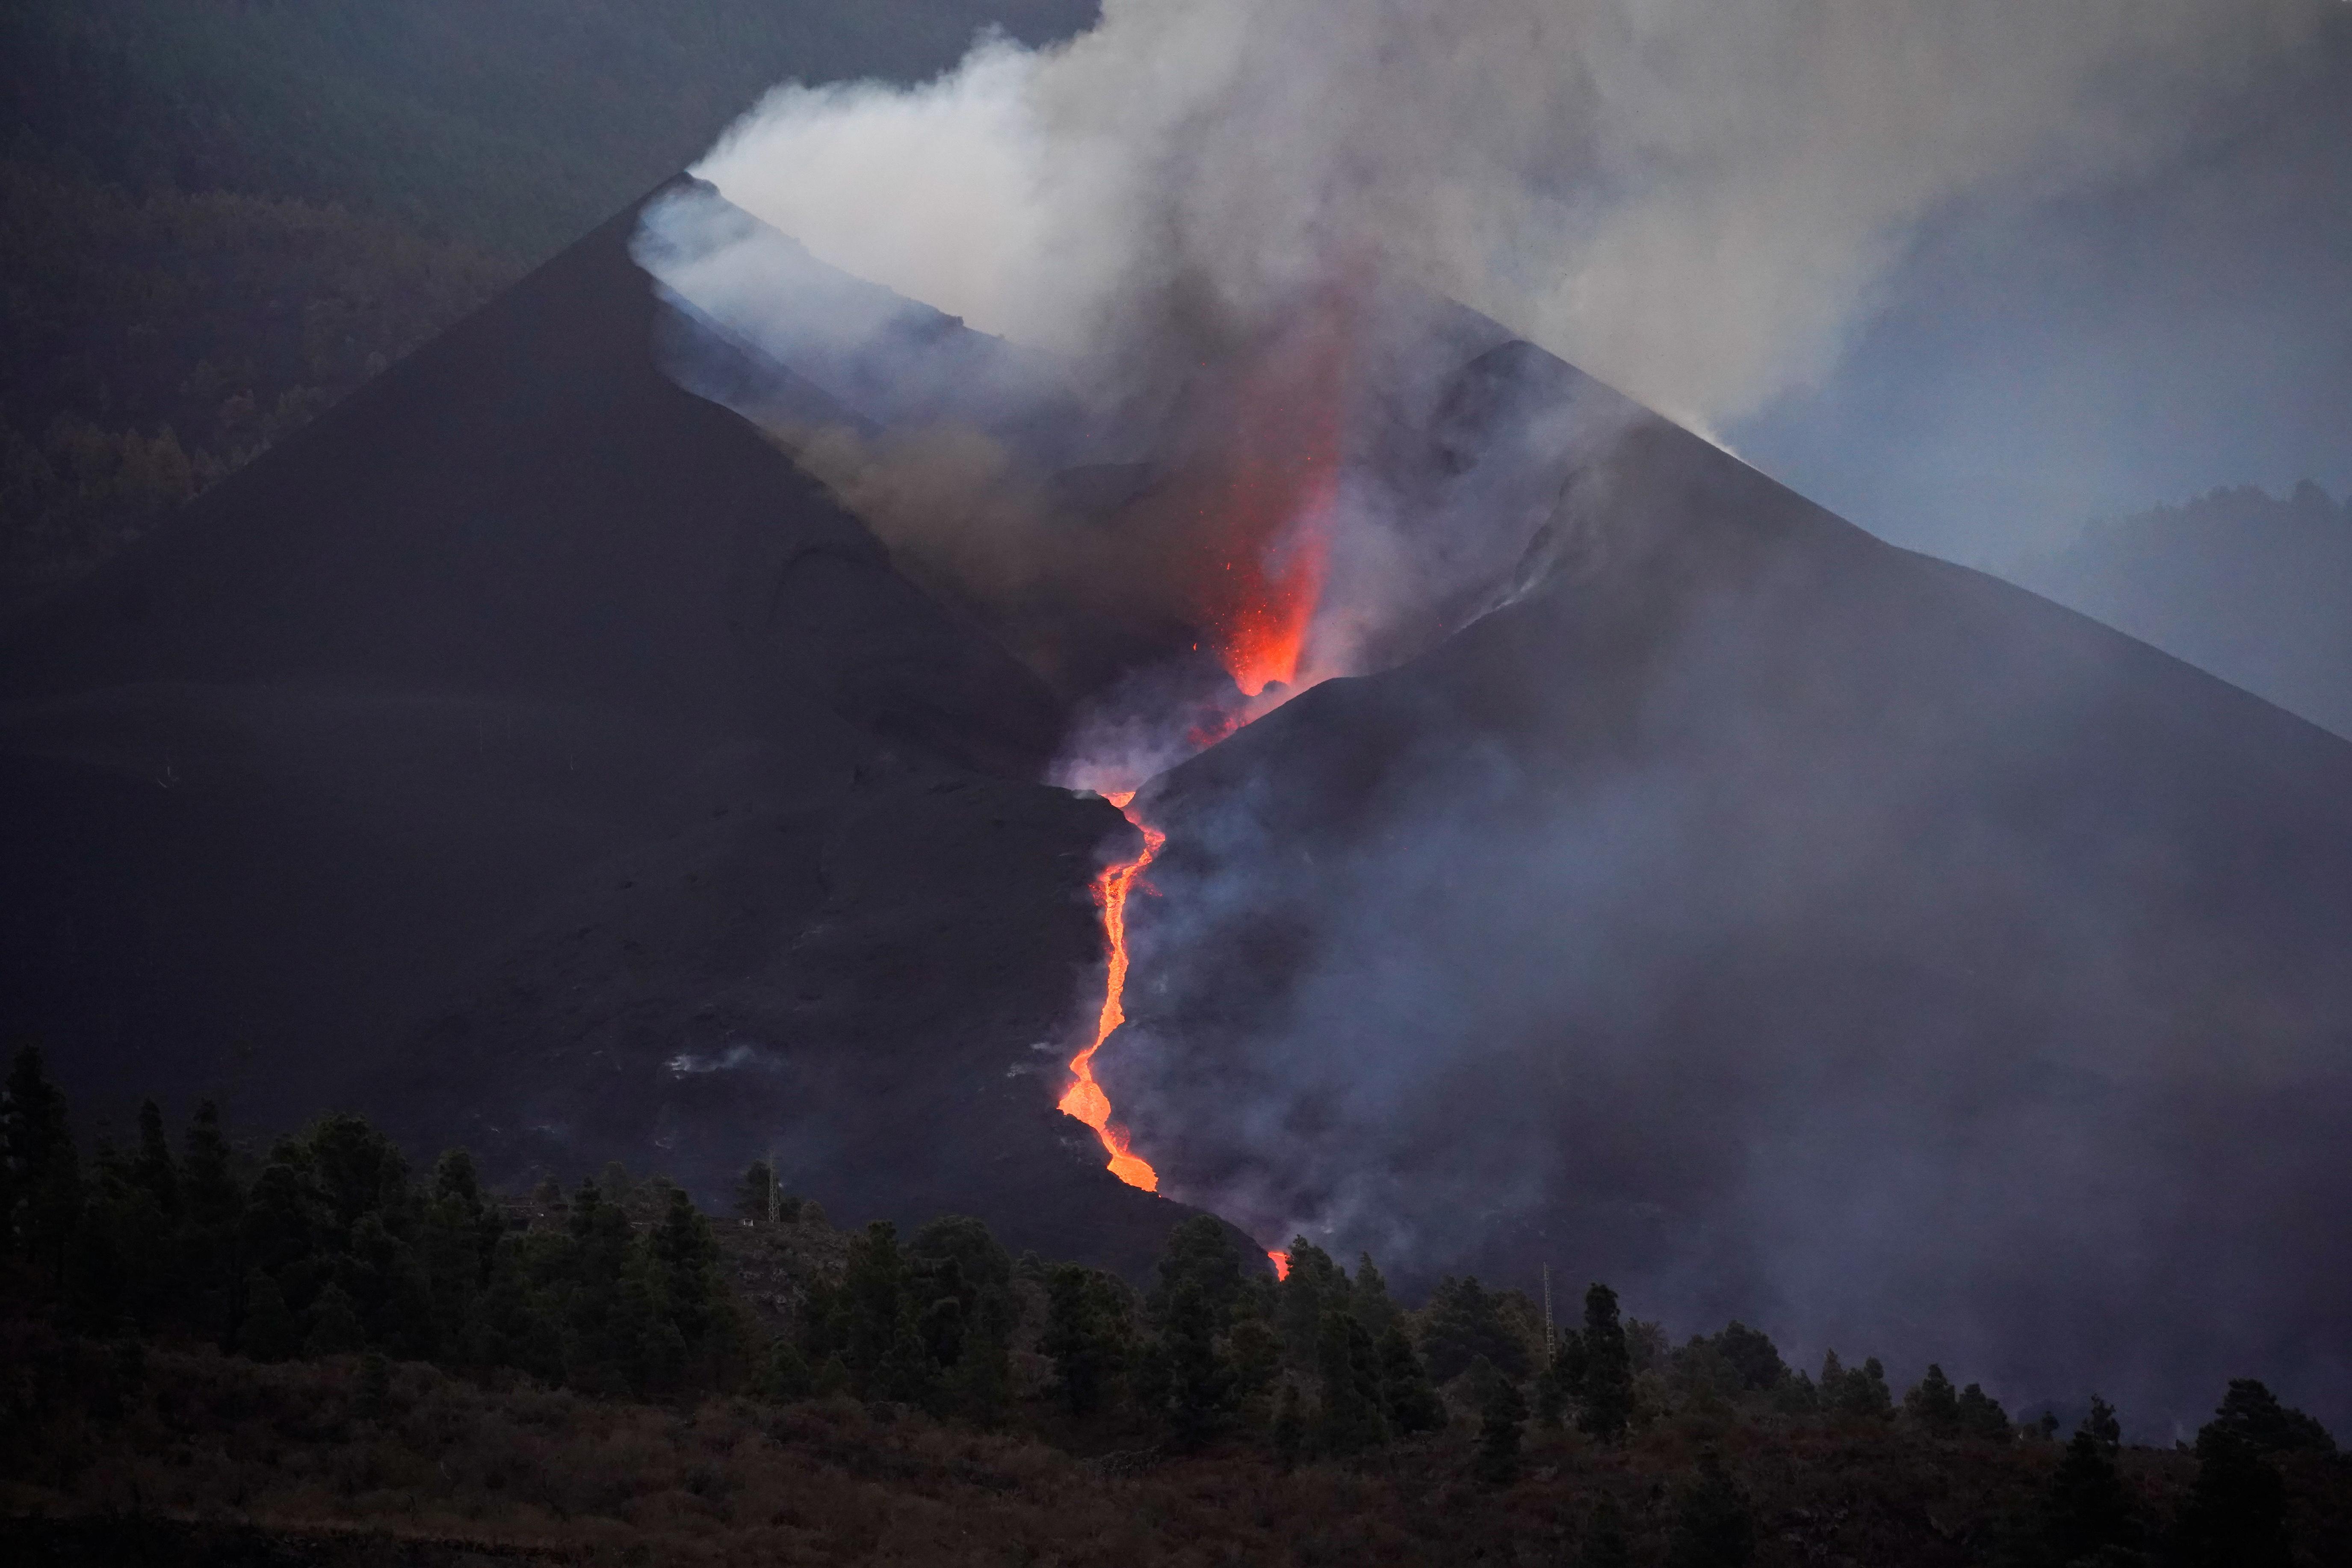 The Cumbre Vieja volcano continues to erupt on the Canary Island of La Palma, as seen from Tajuya, Spain, October 10, 2021. REUTERS/Juan Medina